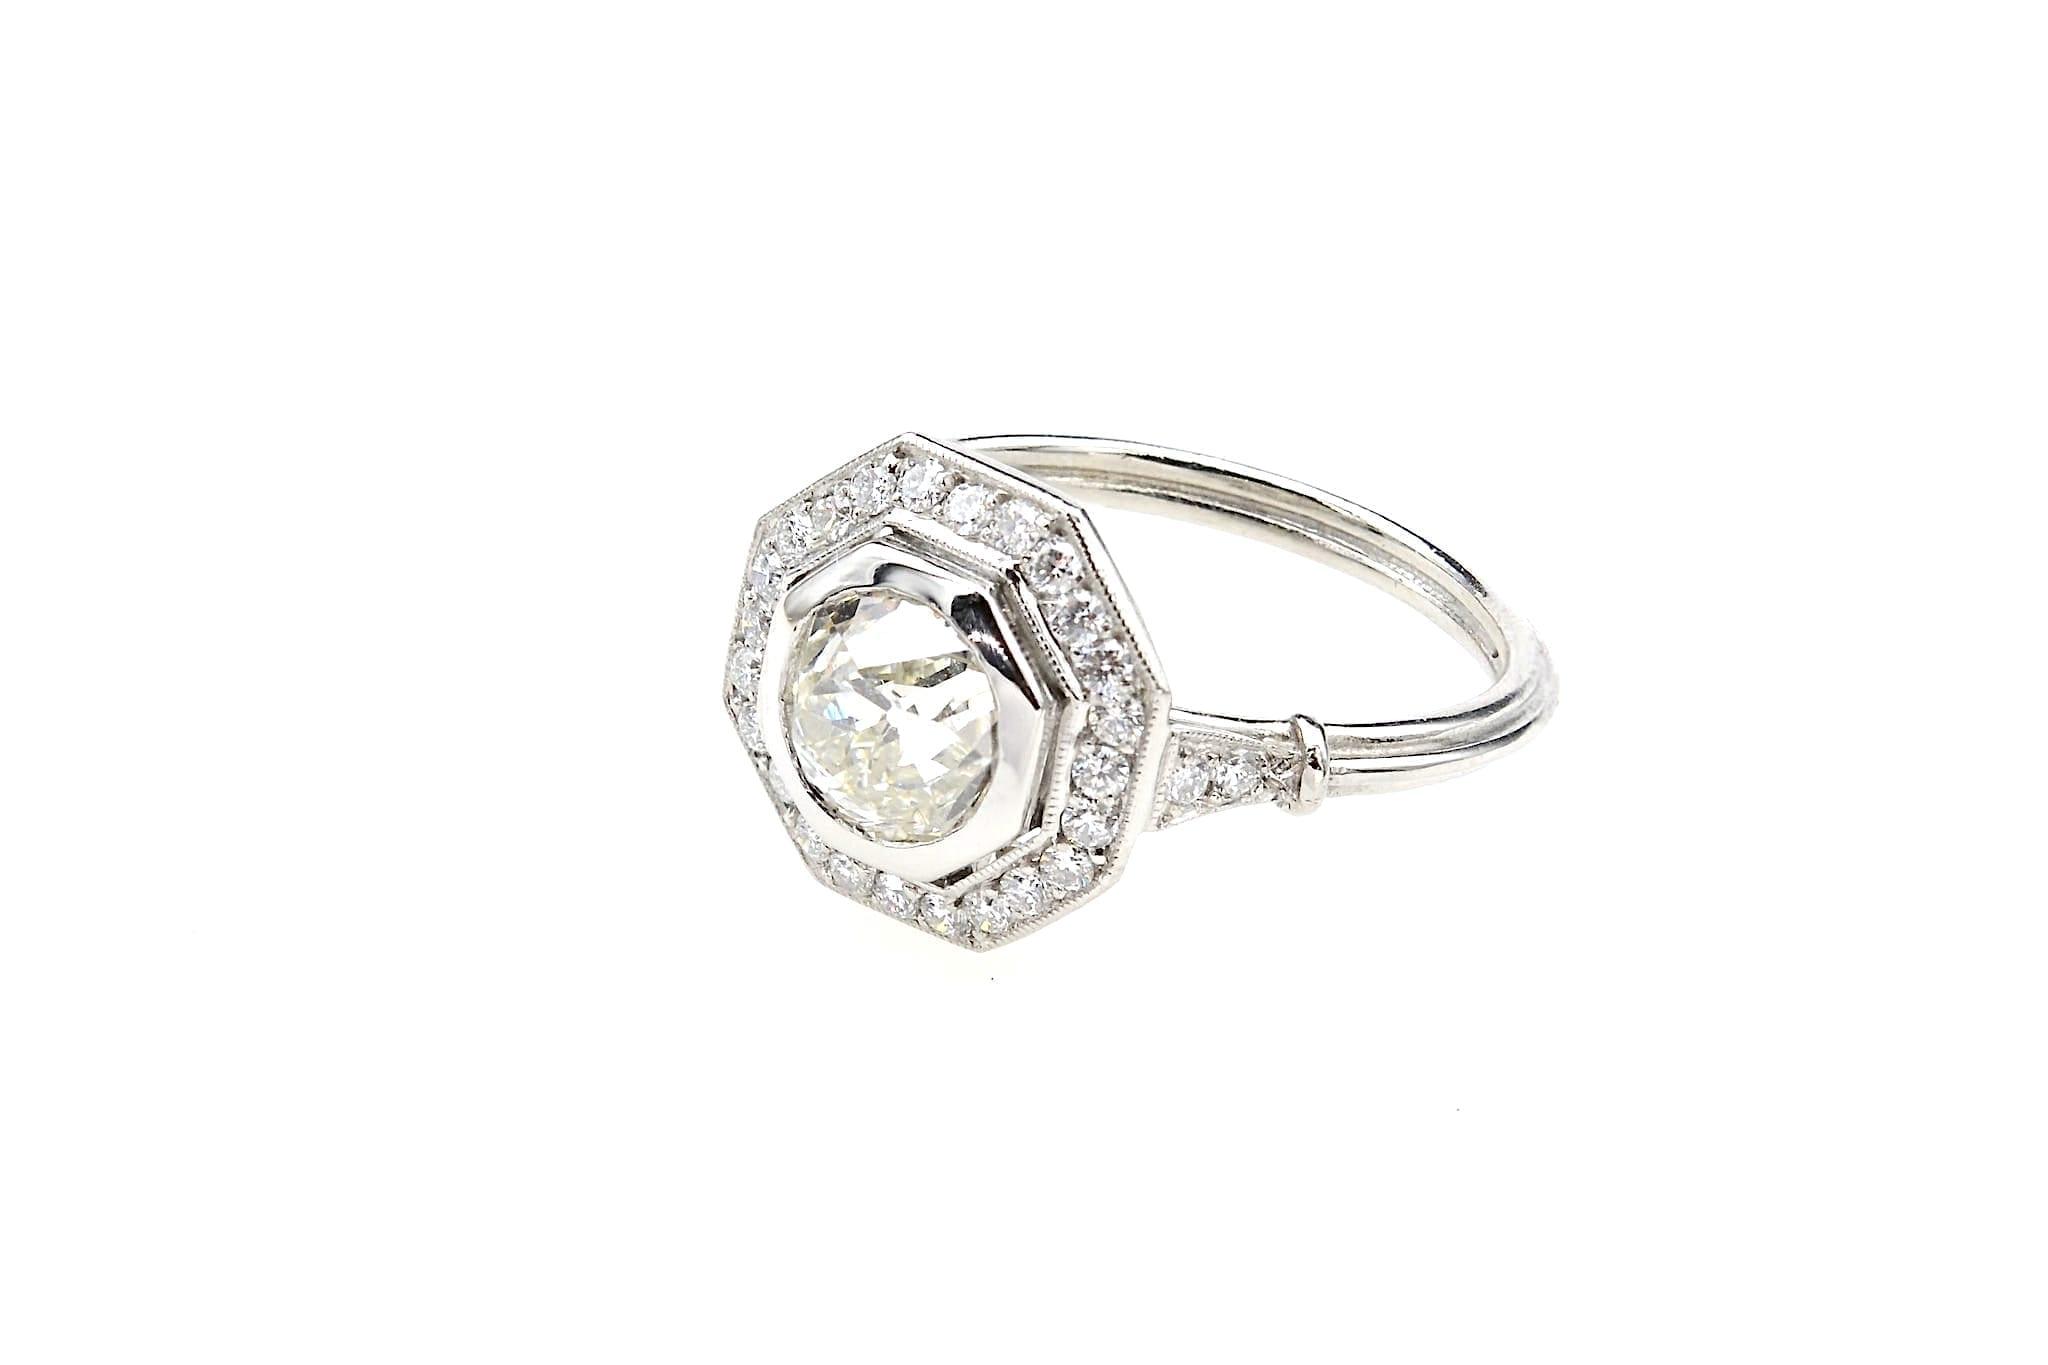 Bague octogonale diamant en platine